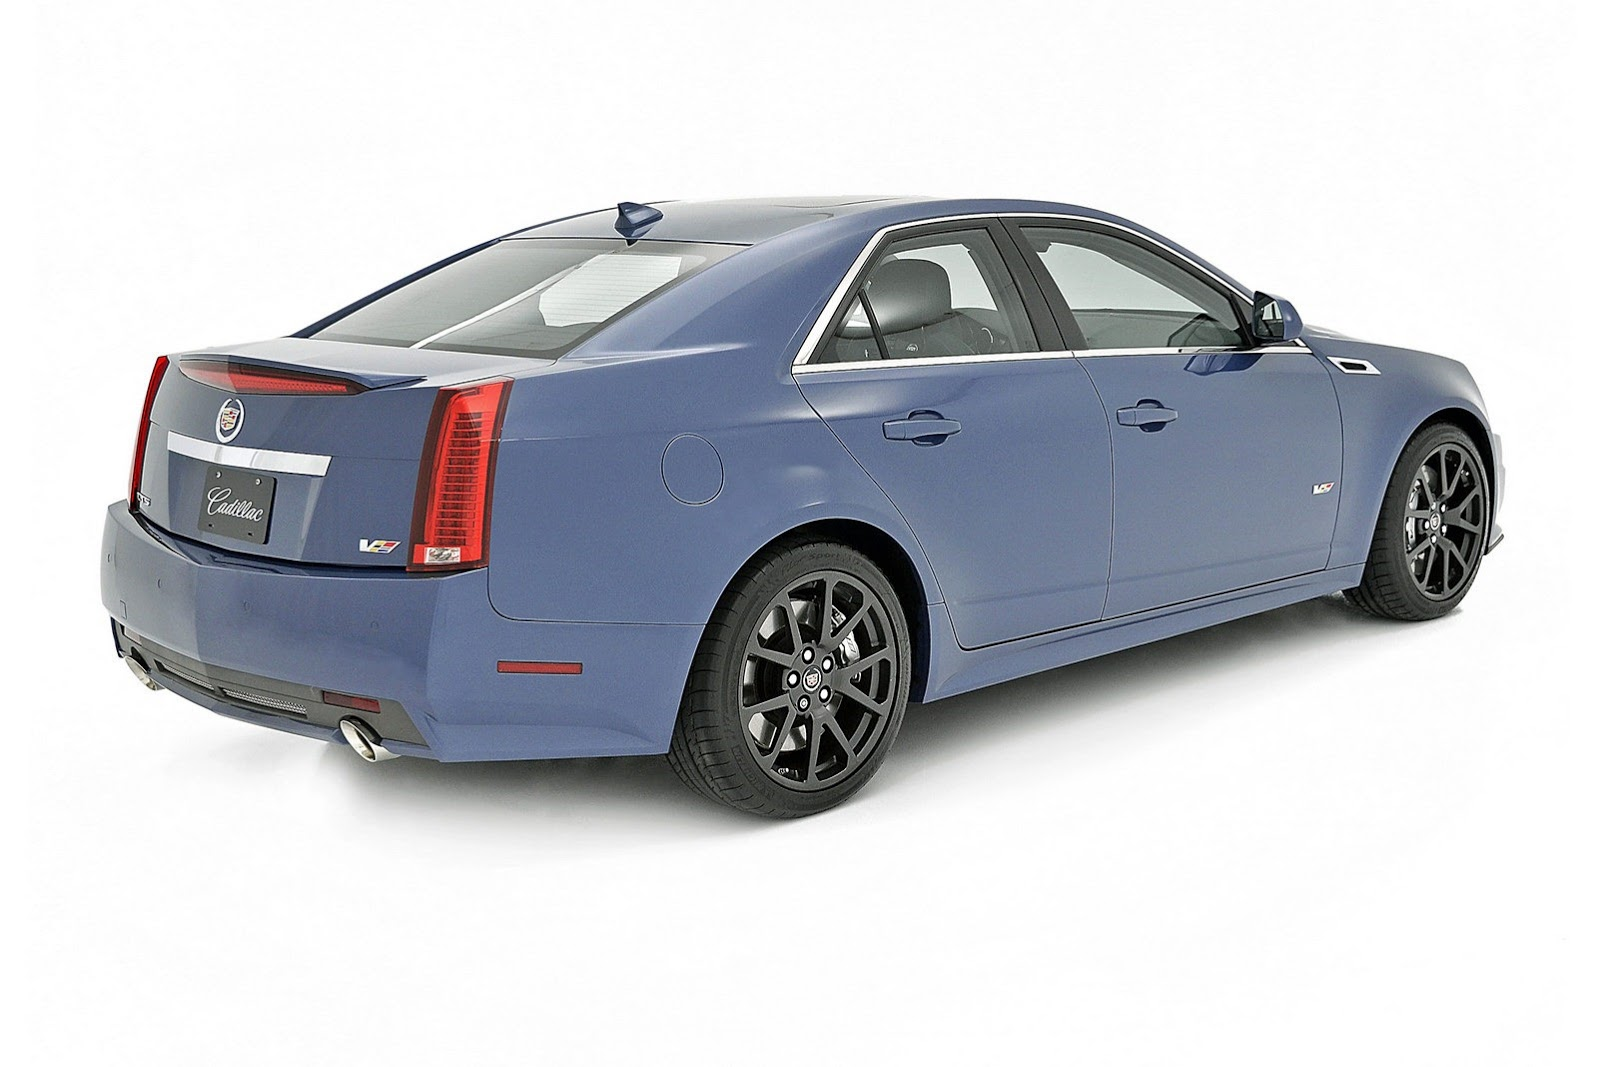 2017 Xt5 Cadillac >> Cadillac Announces Special Edition CTS Models - autoevolution